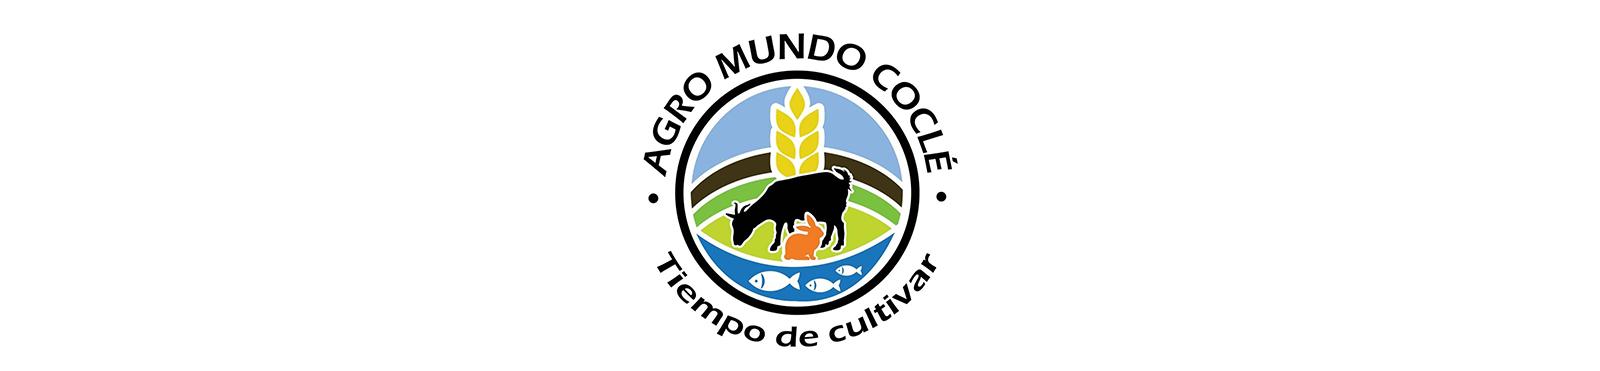 AGRO MUNDO COCLÉ